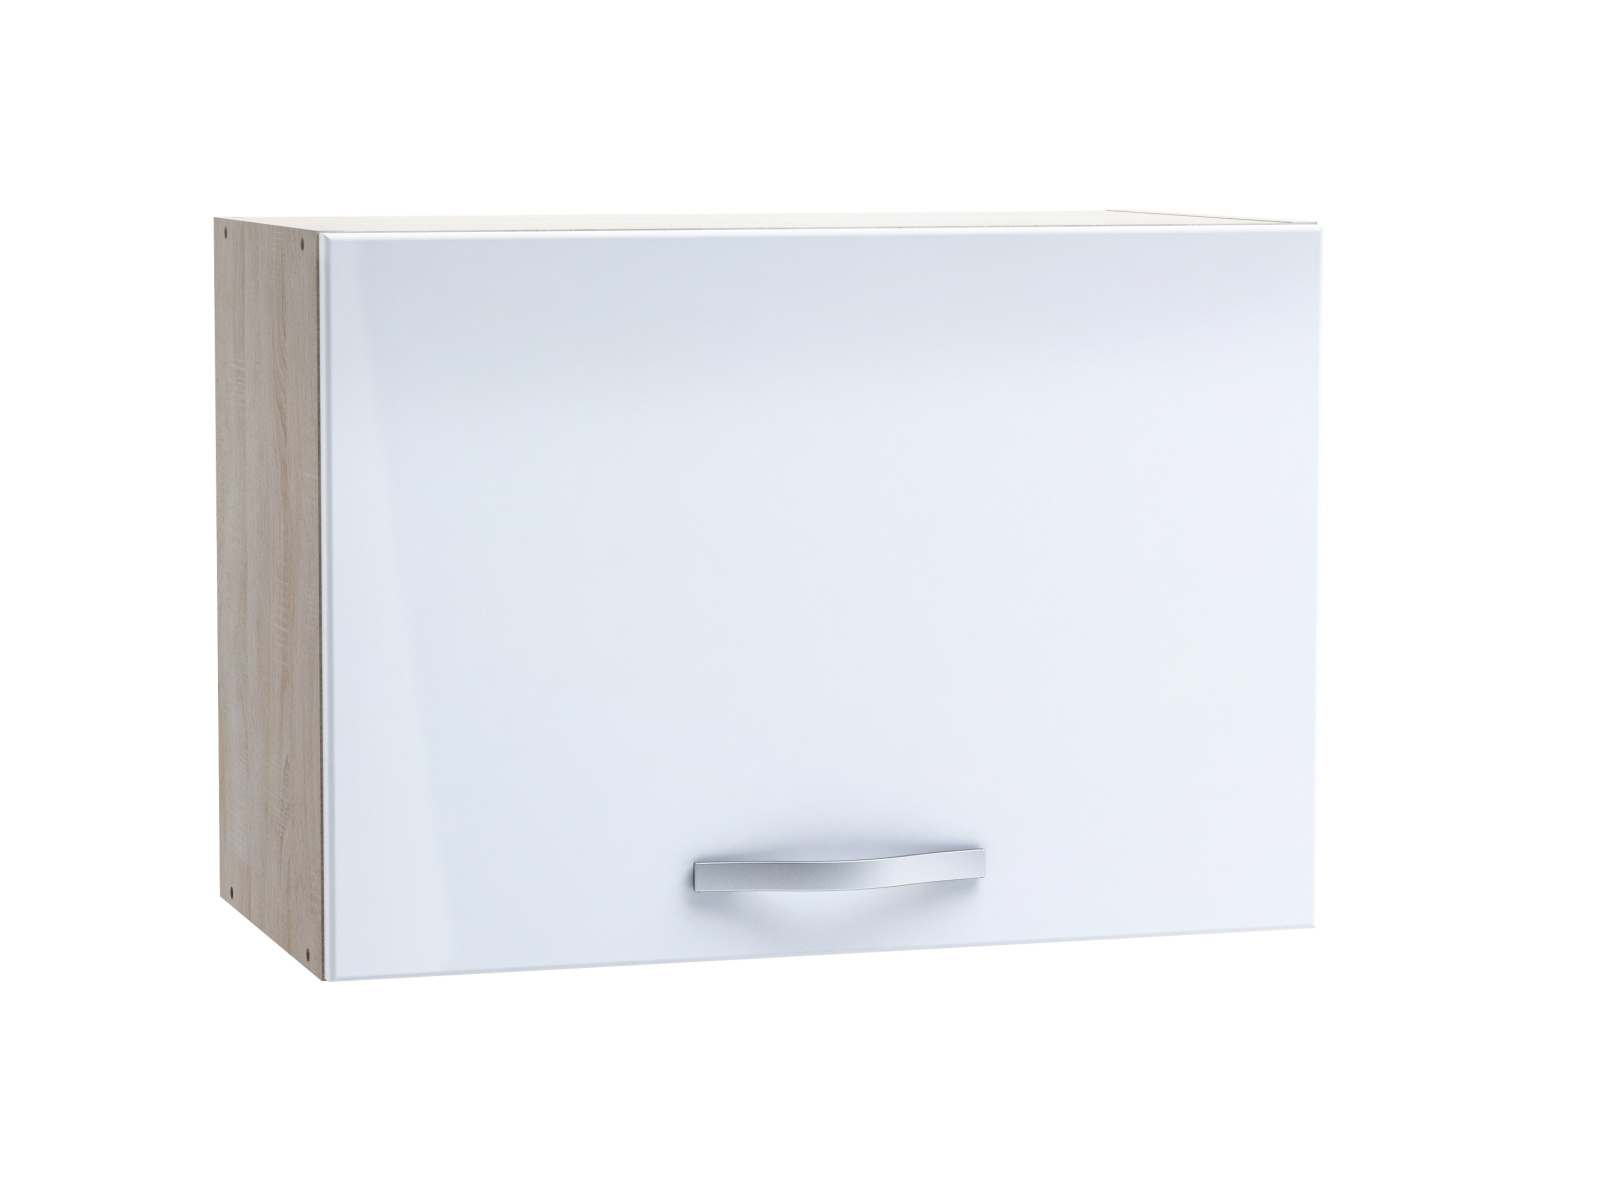 DEMEYERE CHANTILY, skříňka výklopná 60 cm, bílý lesk